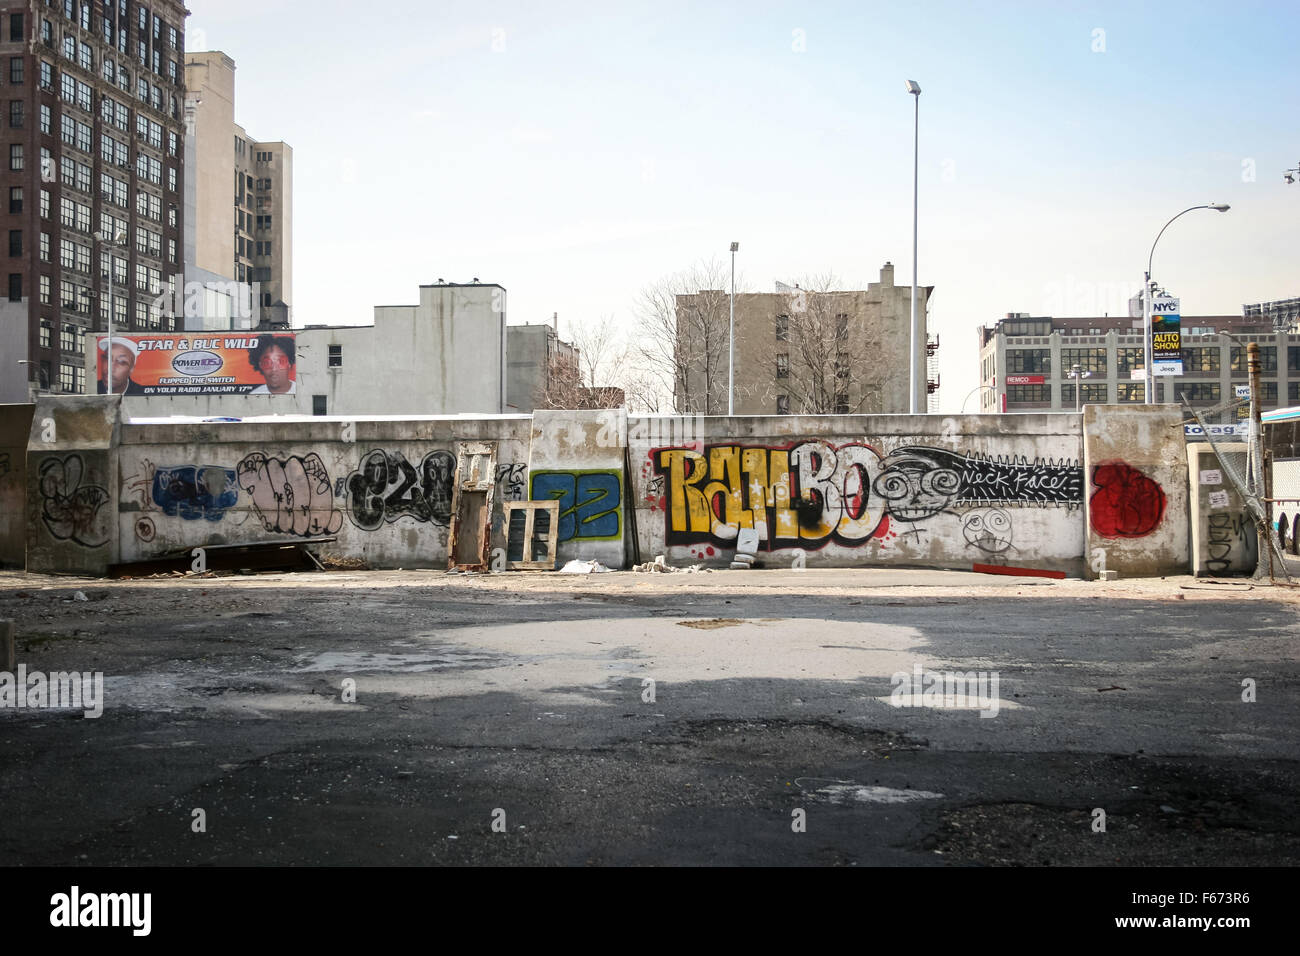 Graffiti wall usa - A Graffiti Wall In The Neighborhood Of Manhattan In New York City Usa